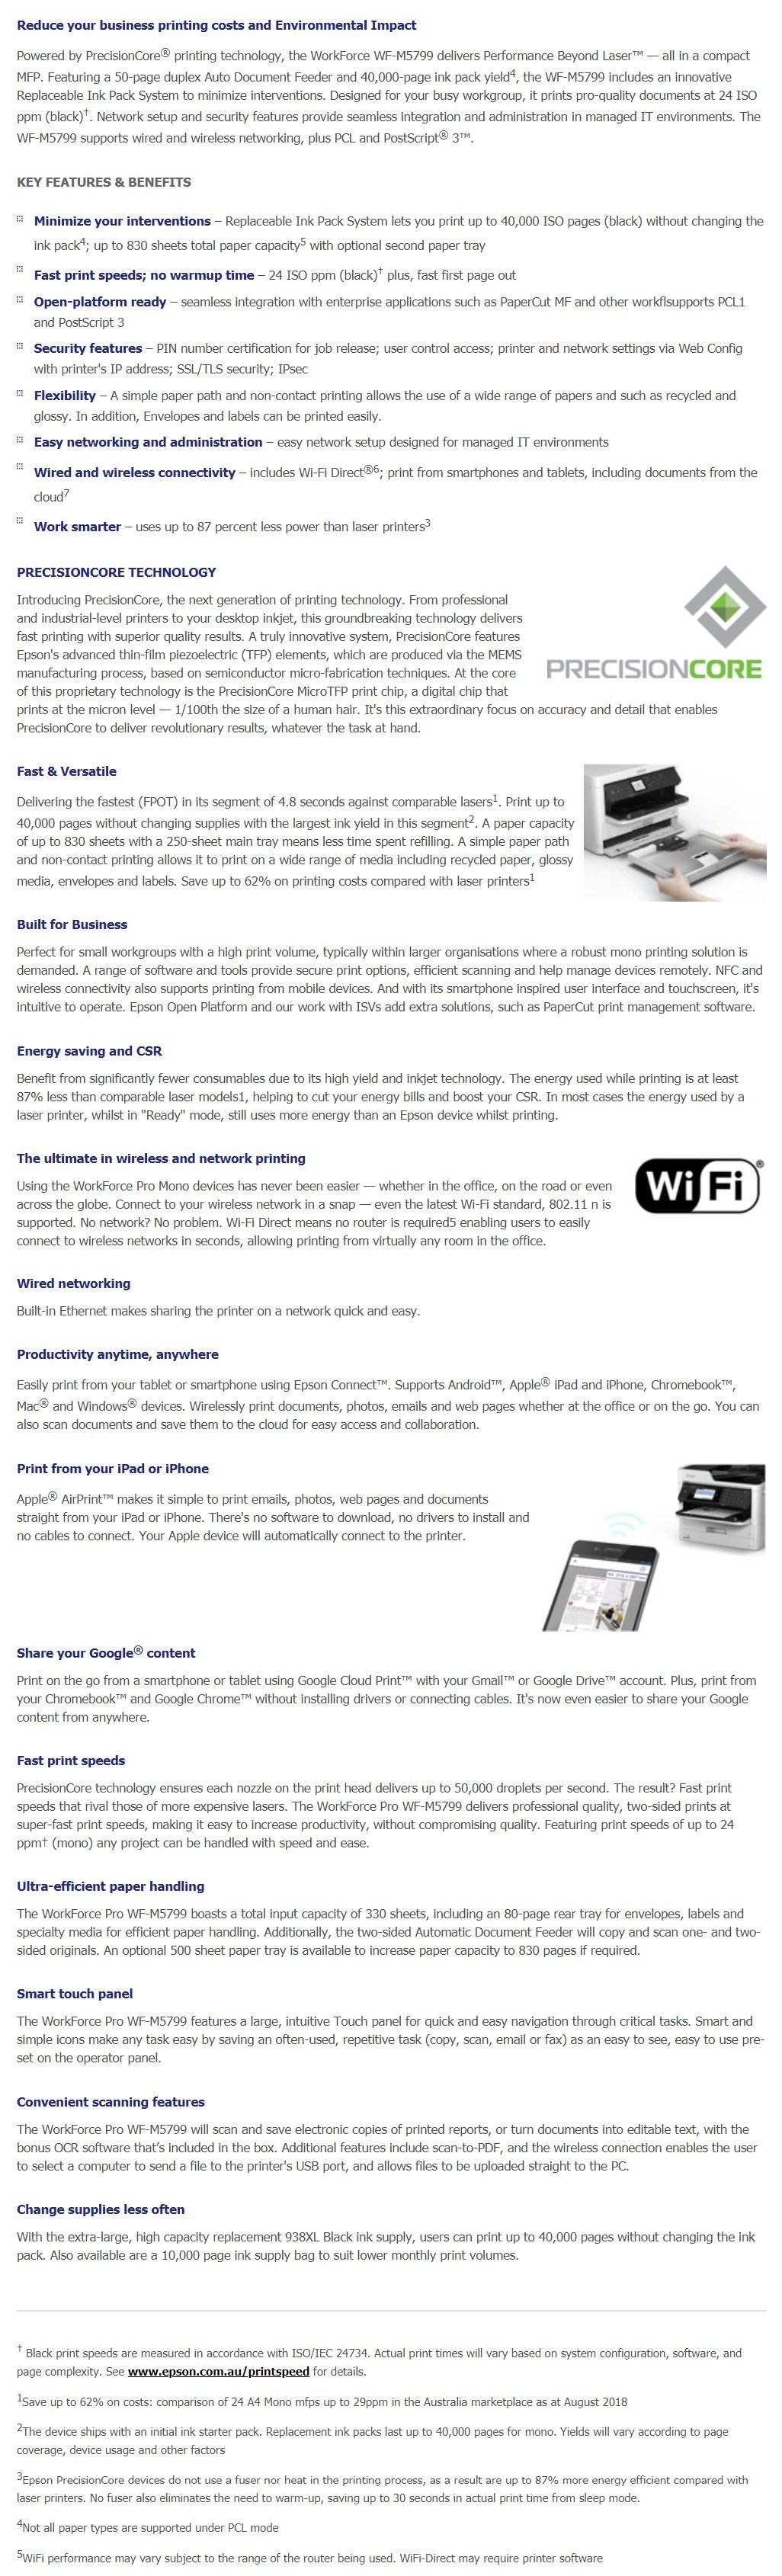 Epson WorkForce Pro WF-M5799 A4 Mono Wireless Inkjet Printer